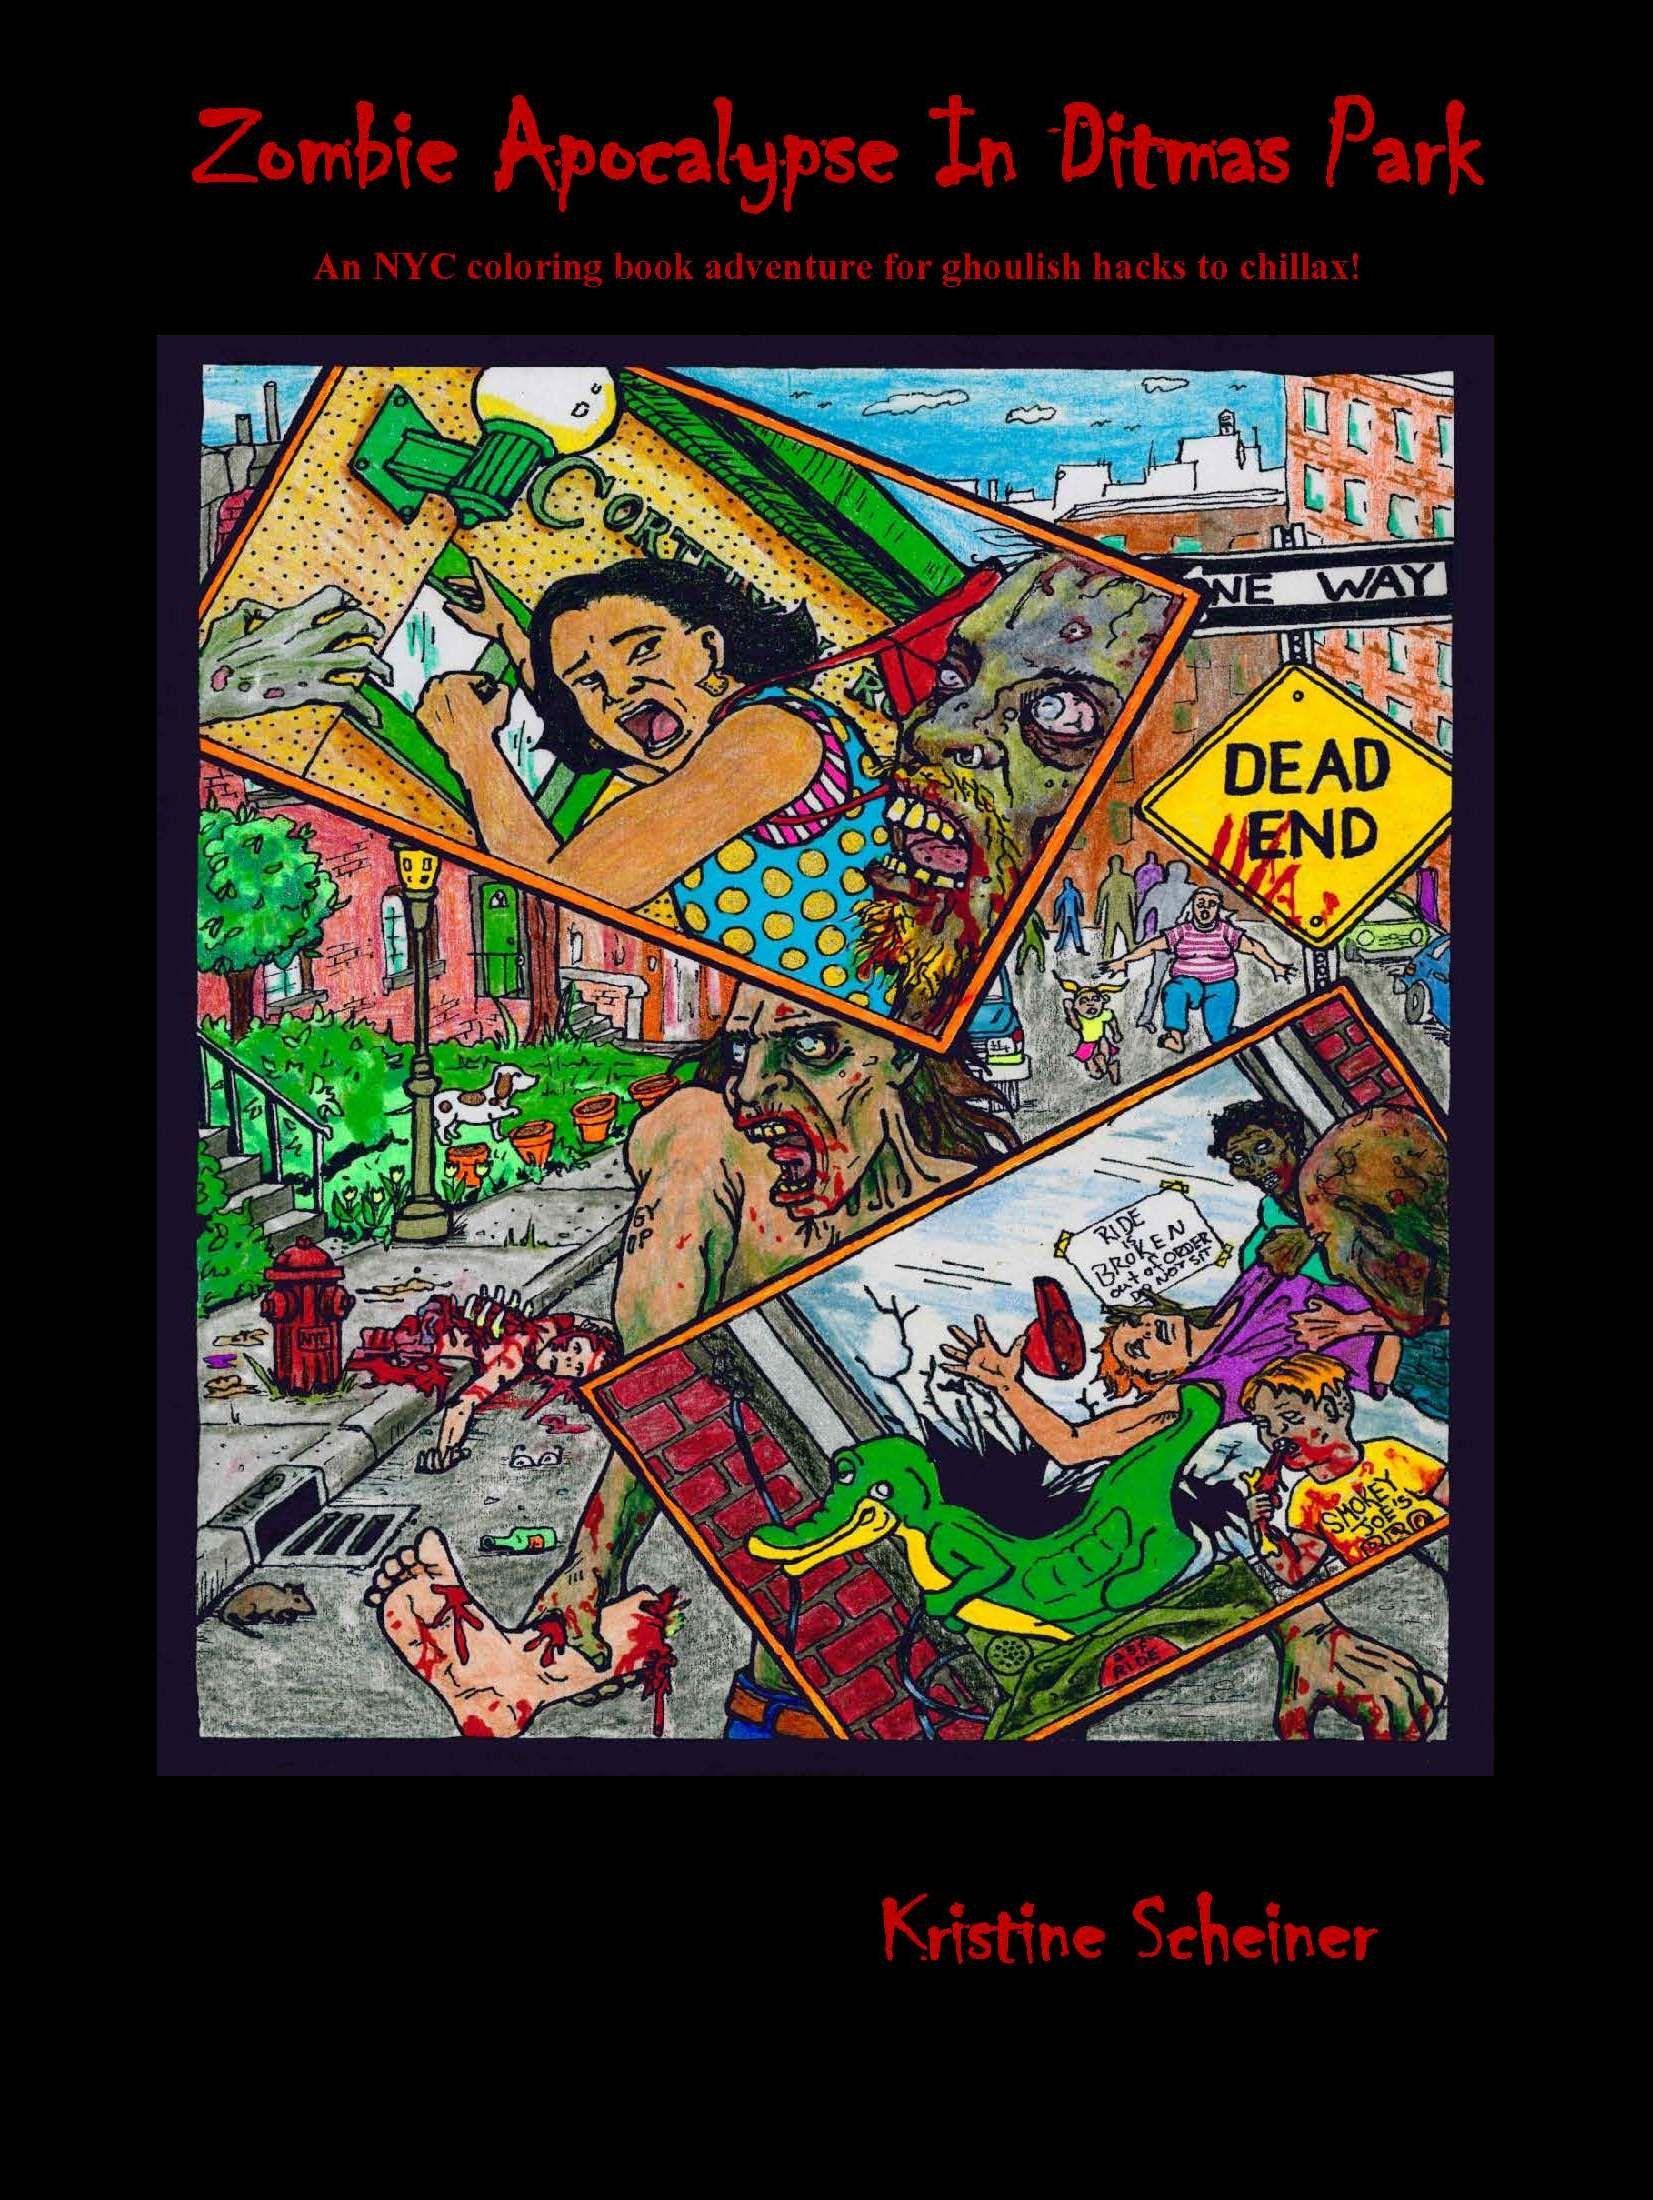 The zombie apocalypse coloring book - Zombie Apocalypse In Ditmas Park Coloring Book